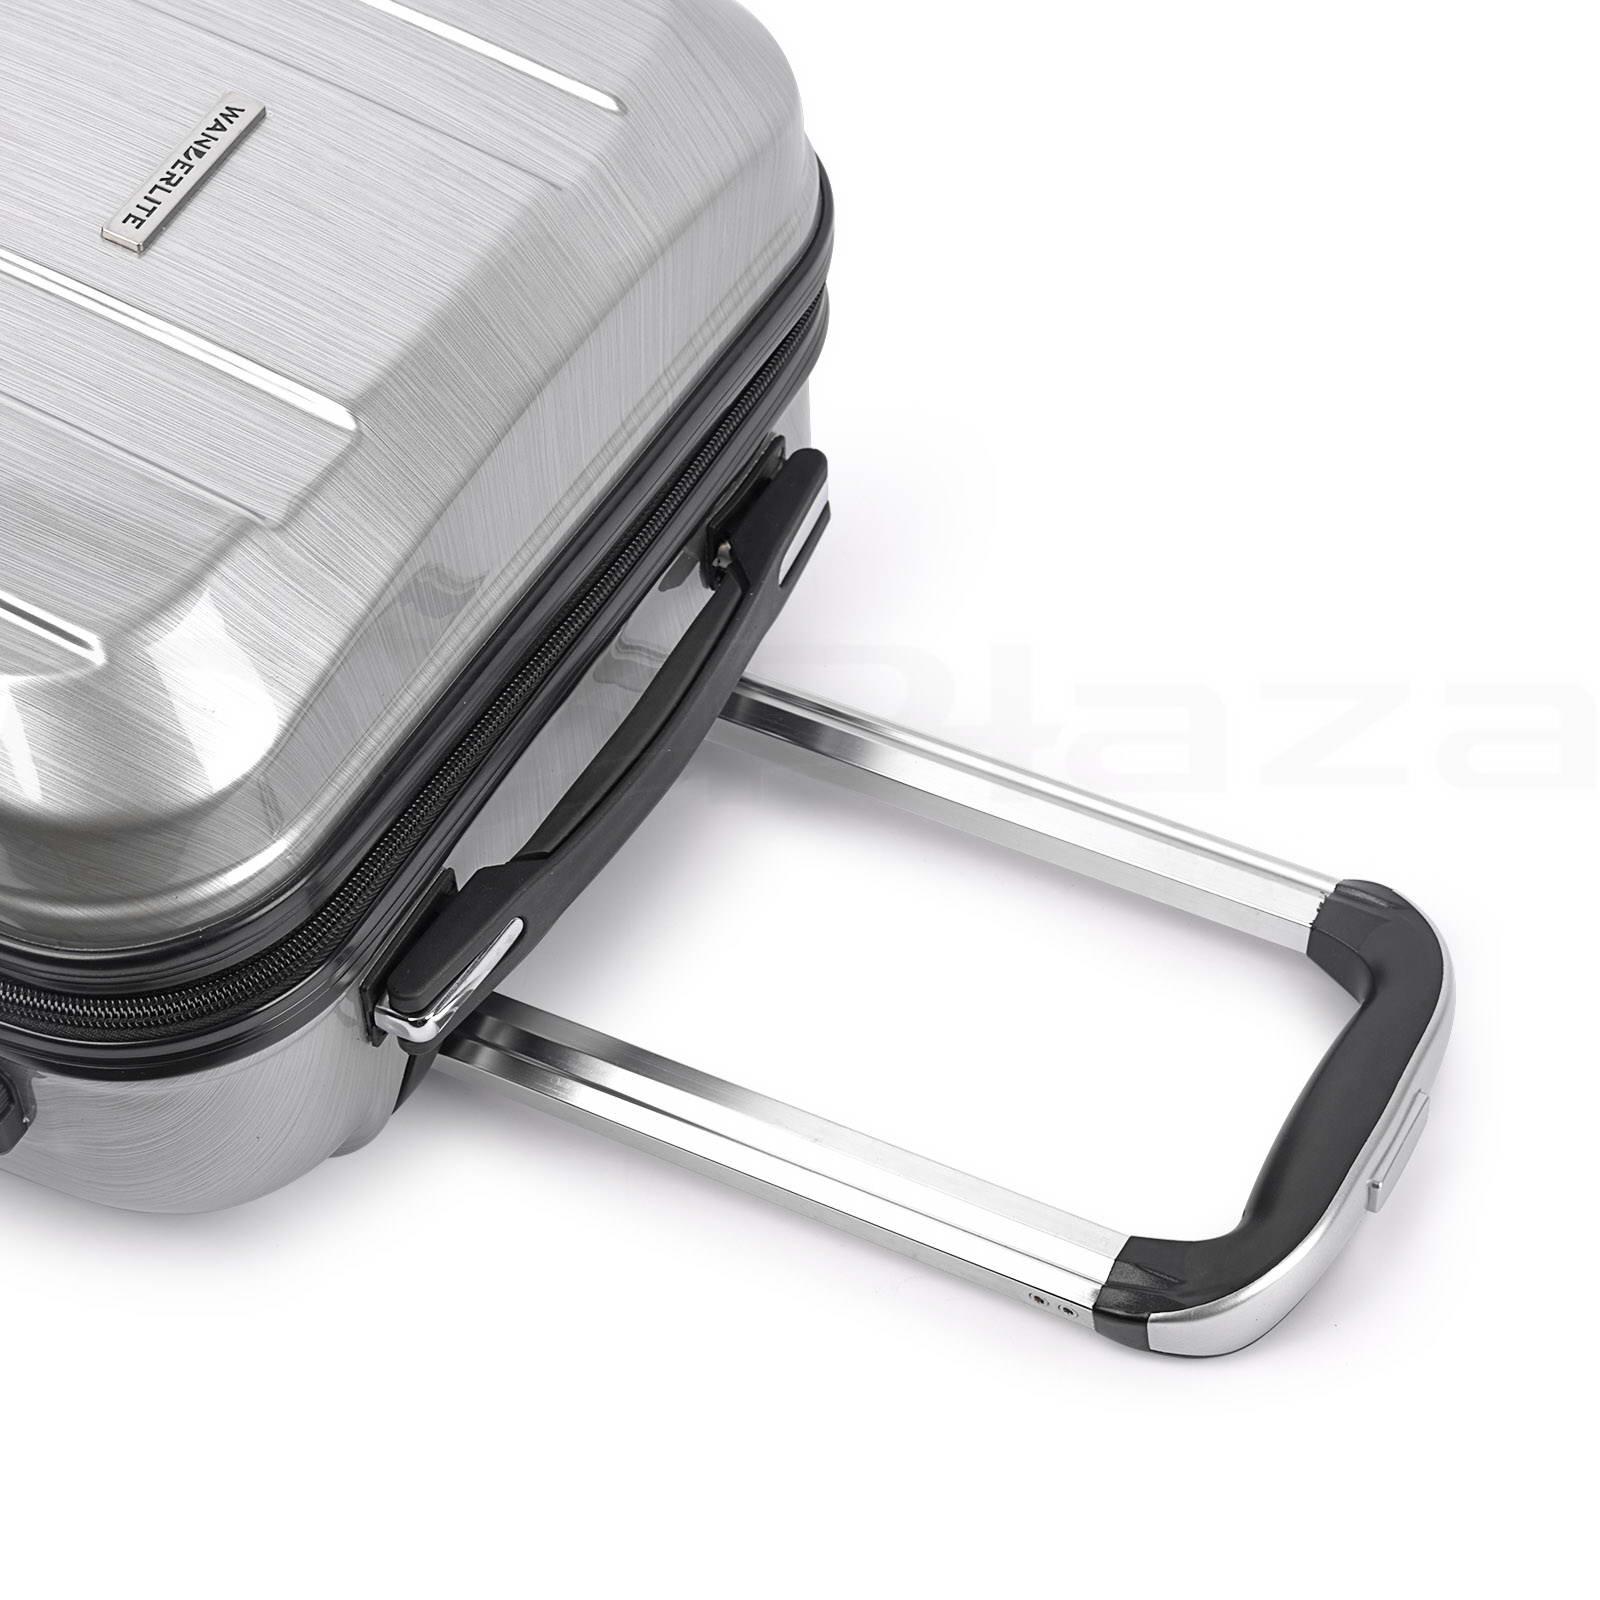 2pc Luggage Suitcase Trolley Set Tsa Carry On Bag Hard Case Lightweight Ebay